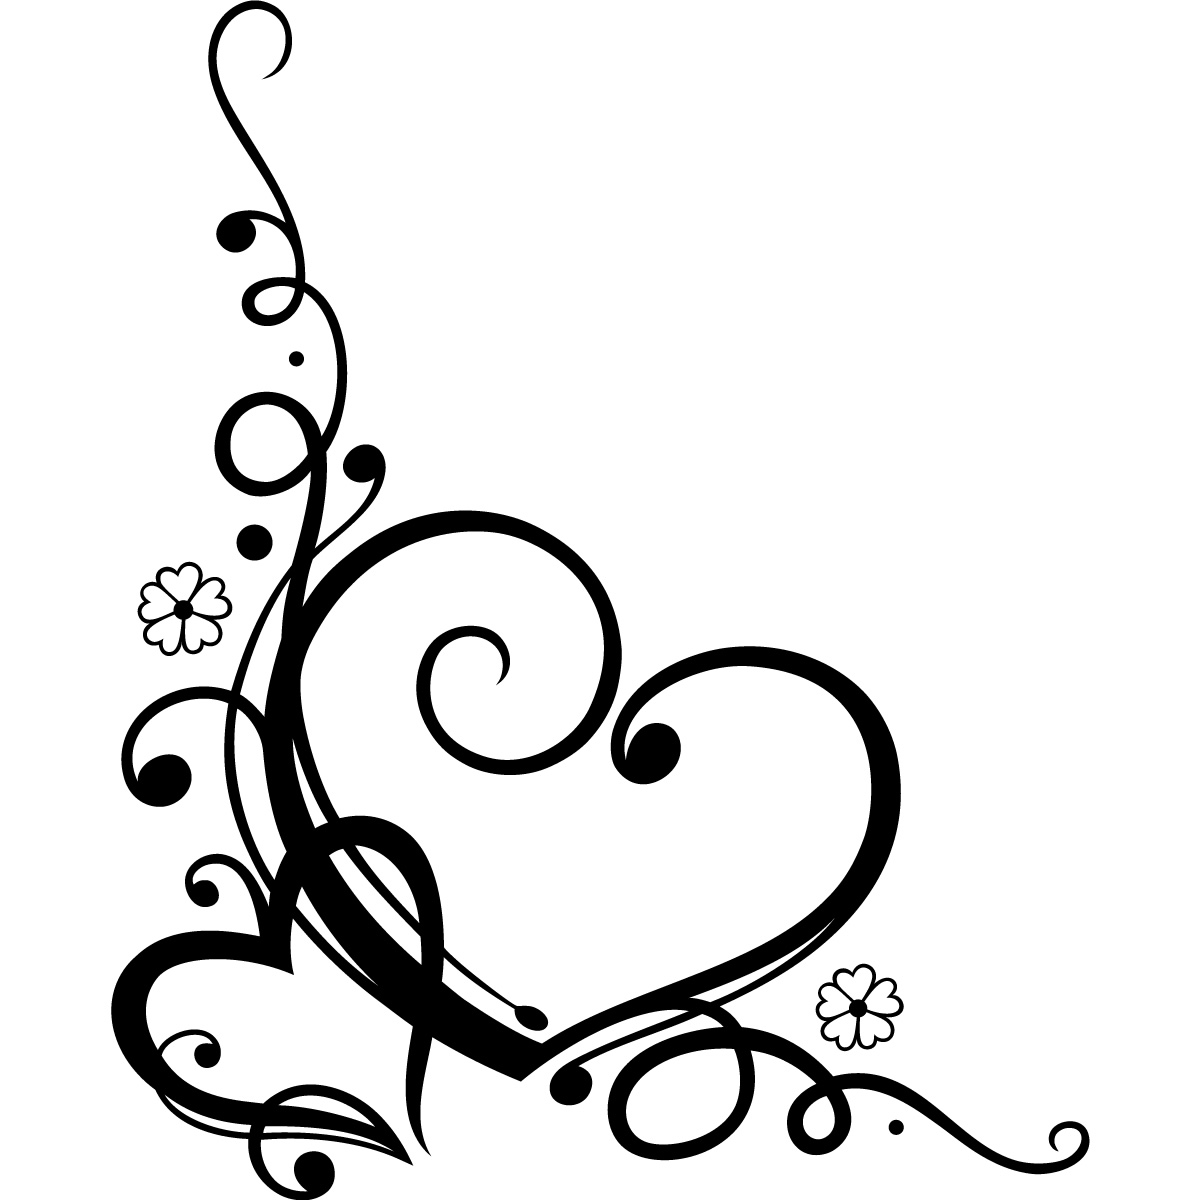 Decorative Love Heart Floral Wall Art Sticker Wall Decal